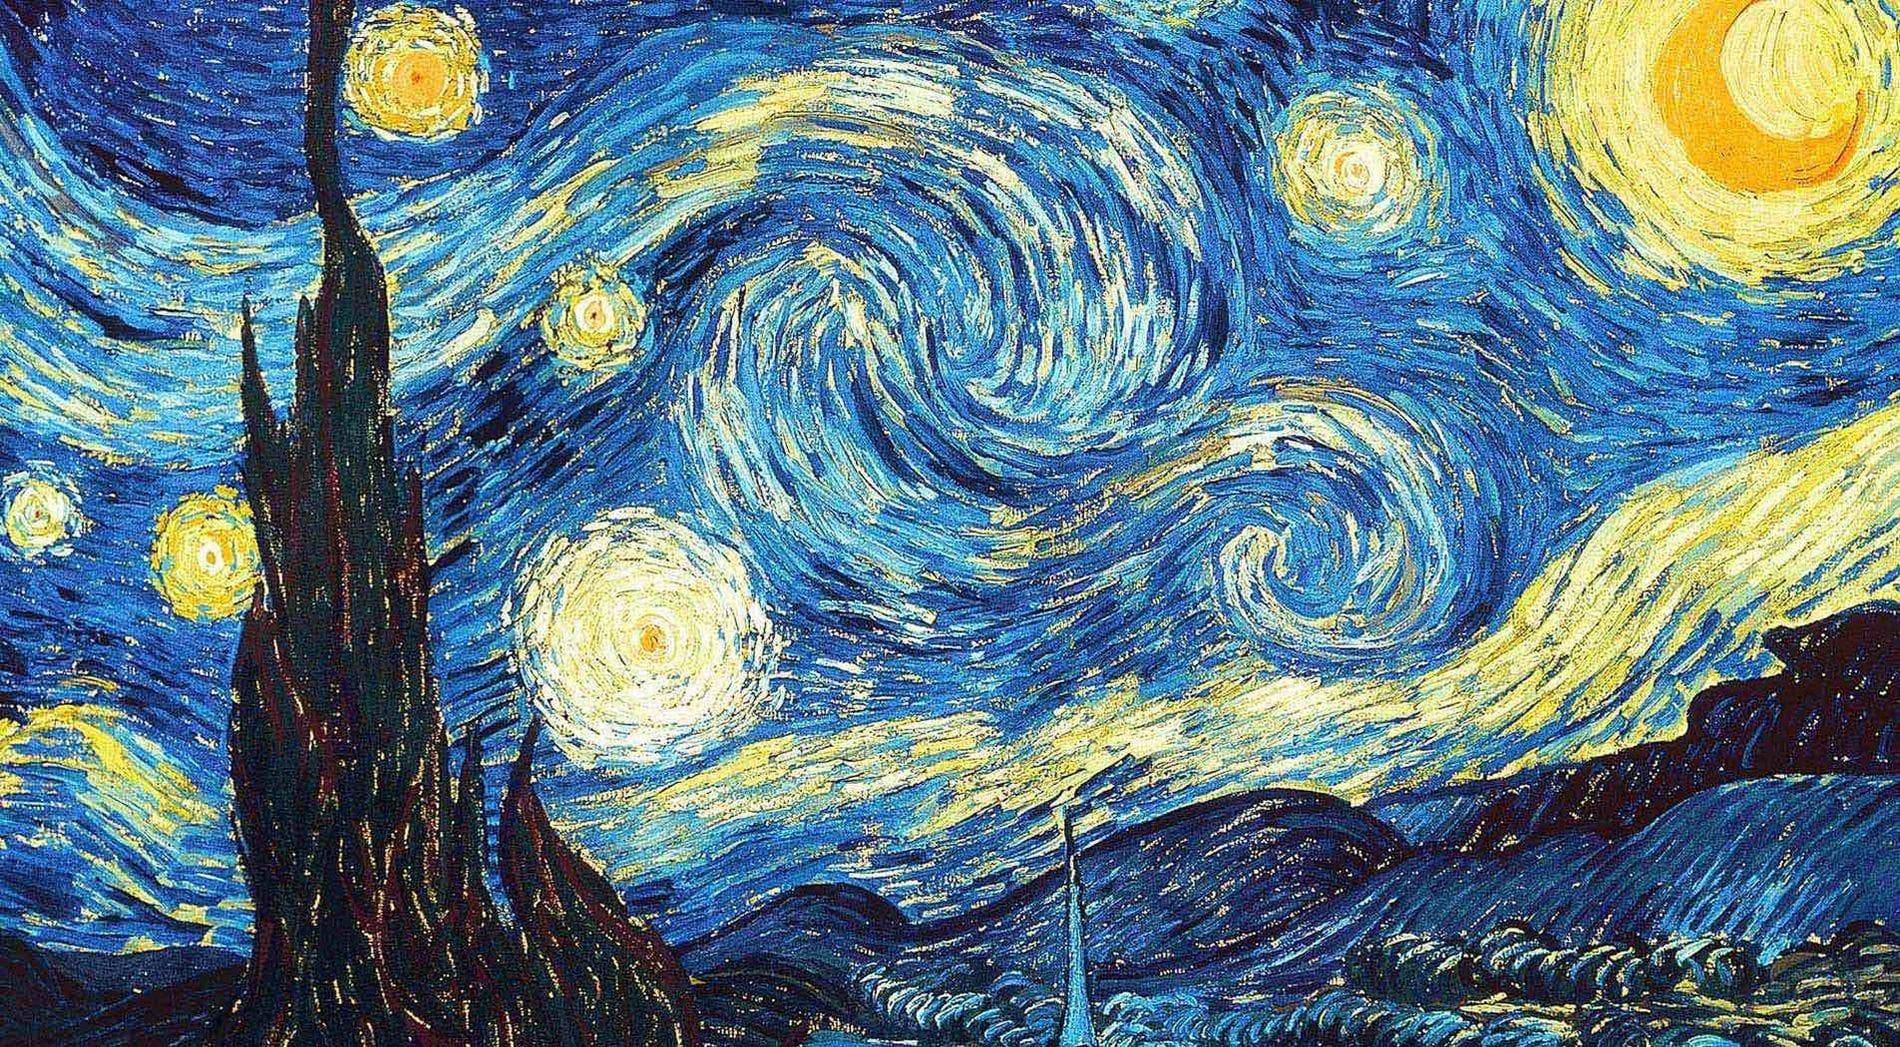 Vincent Van Gogh | Starry Night (1889)